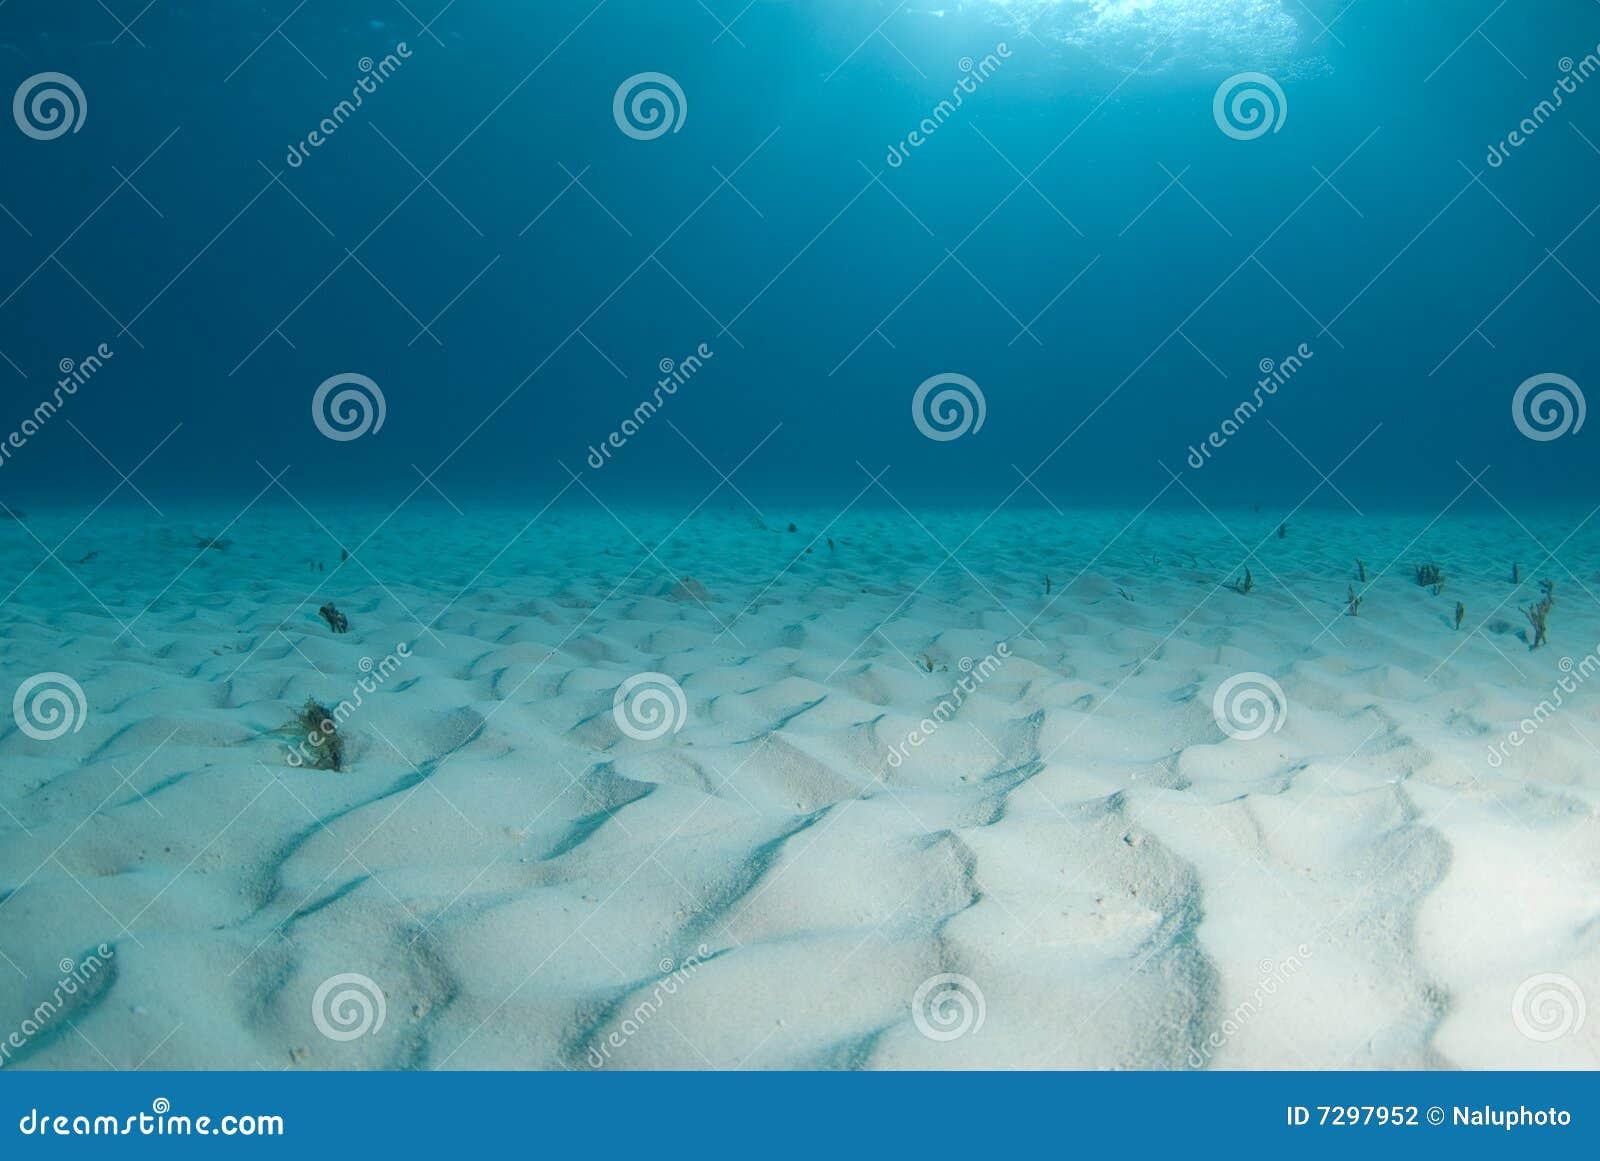 Tiger Beach Seascape